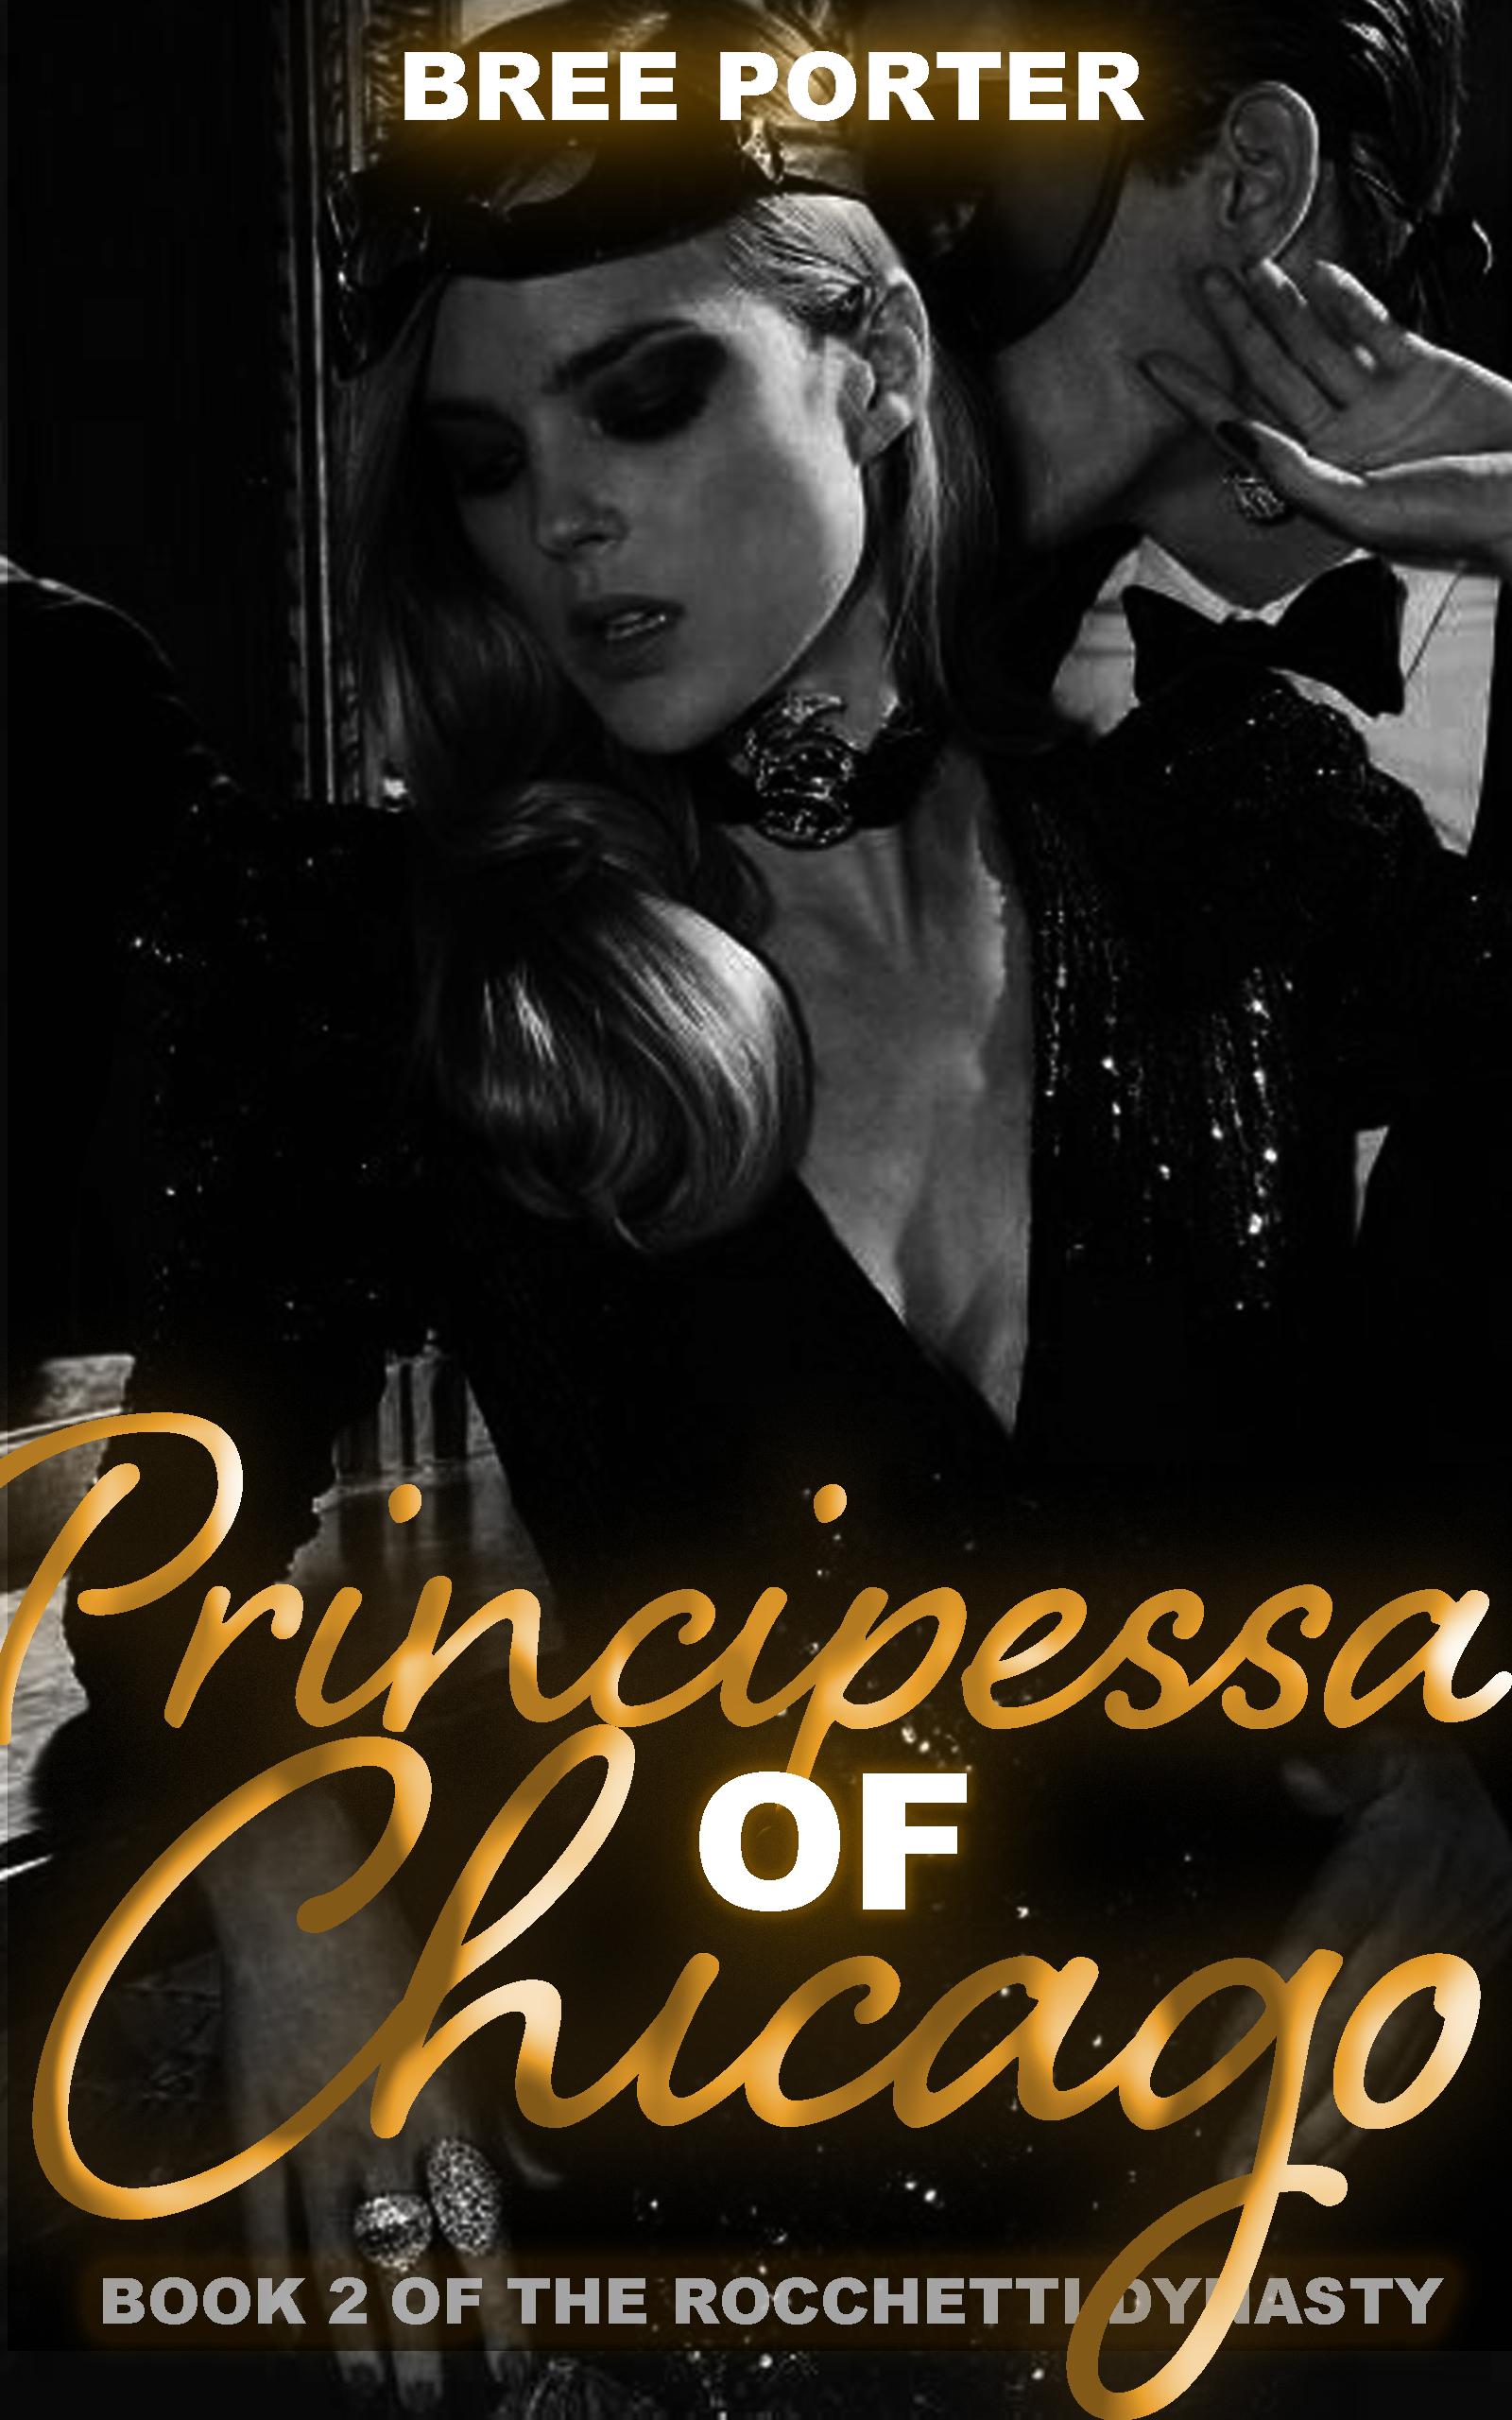 Principessa of Chicago (The Rocchetti Dynasty #2) by Bree Porter